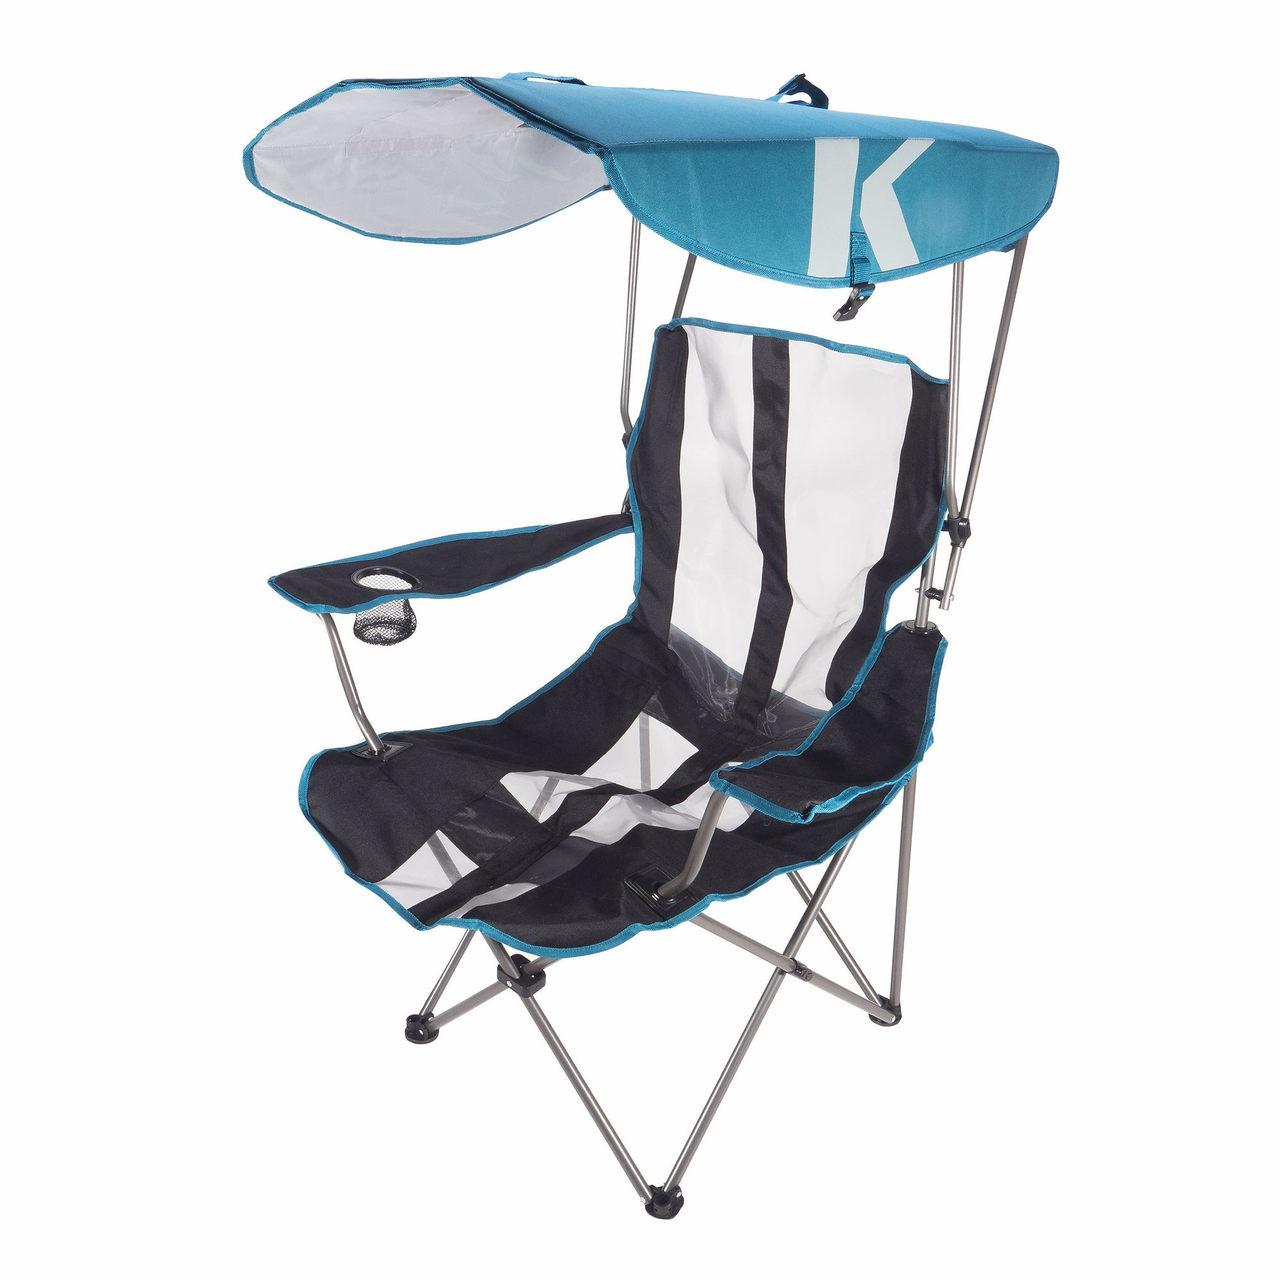 Incredible Kelsyus Original Canopy Chair Assorted 80186 Customarchery Wood Chair Design Ideas Customarcherynet